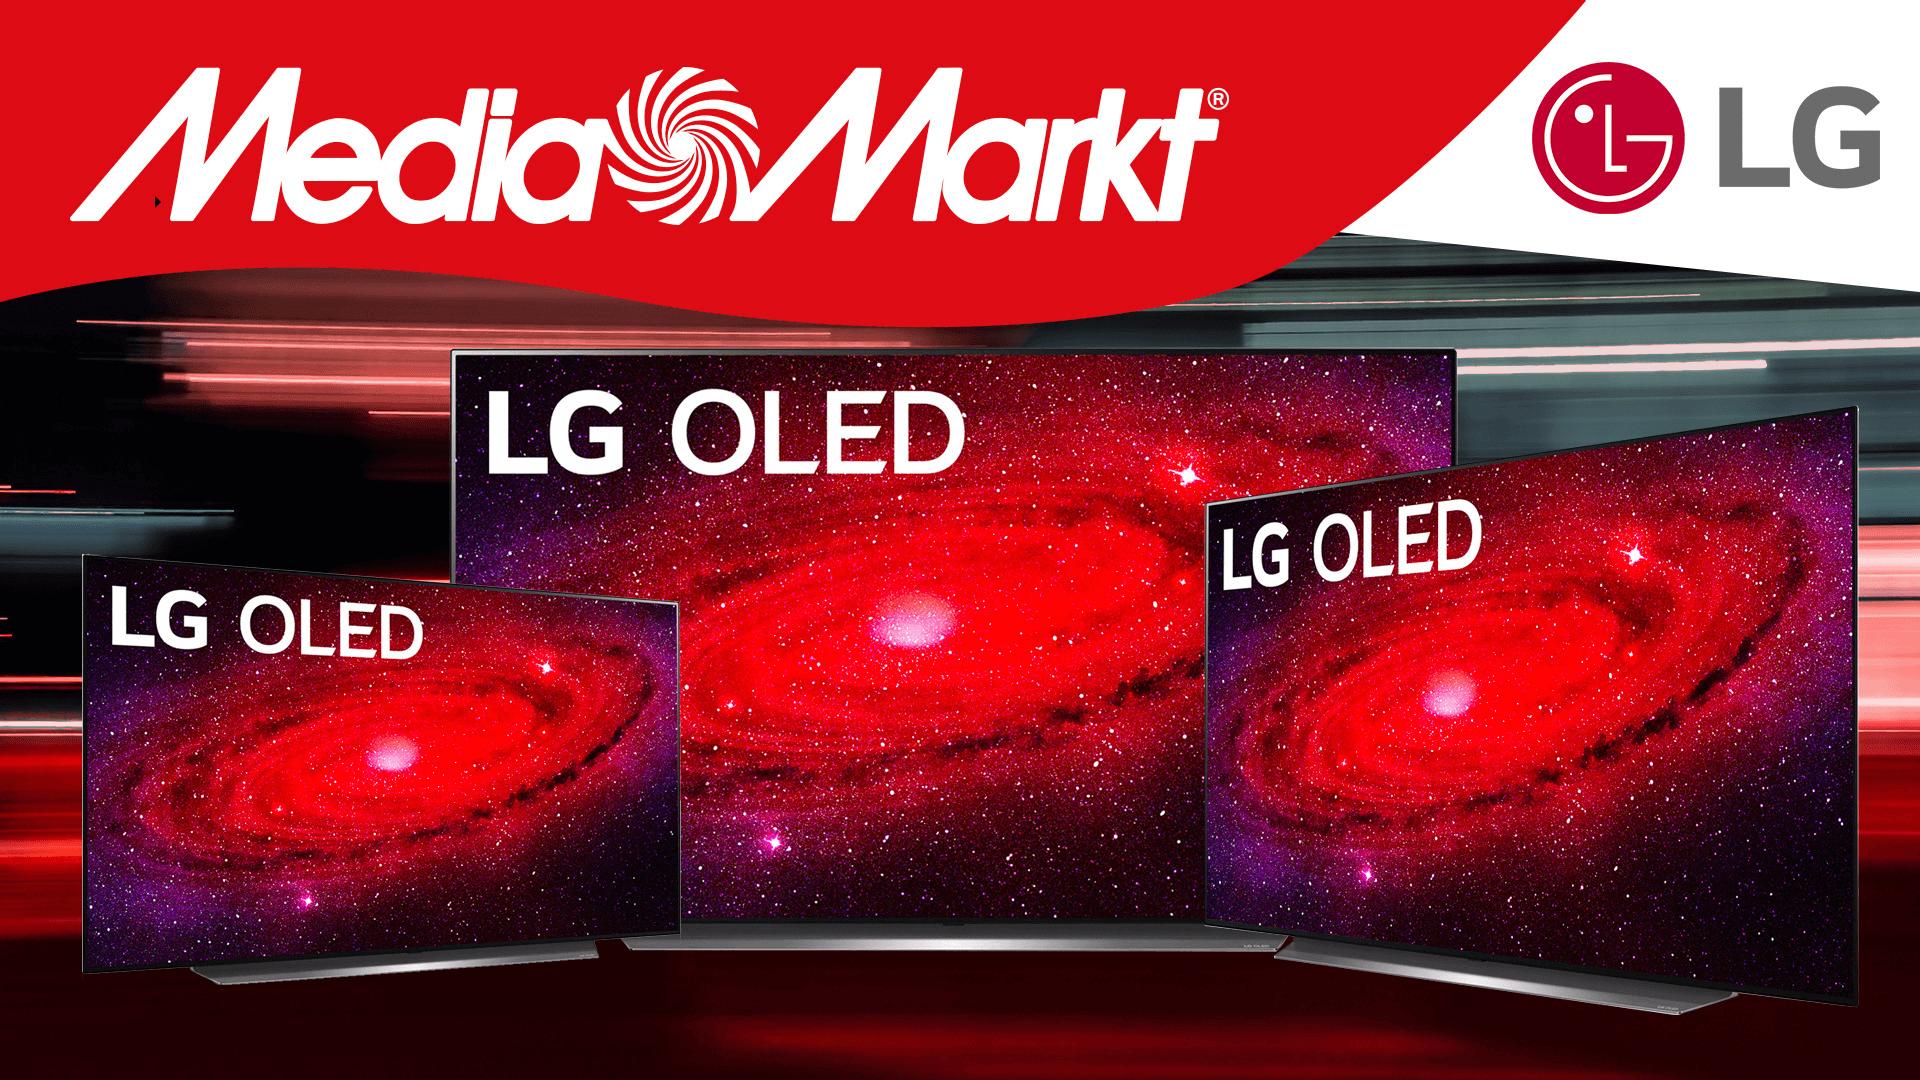 Tv, LG, Fernseher, Media Markt, Mediamarkt, LG OLED